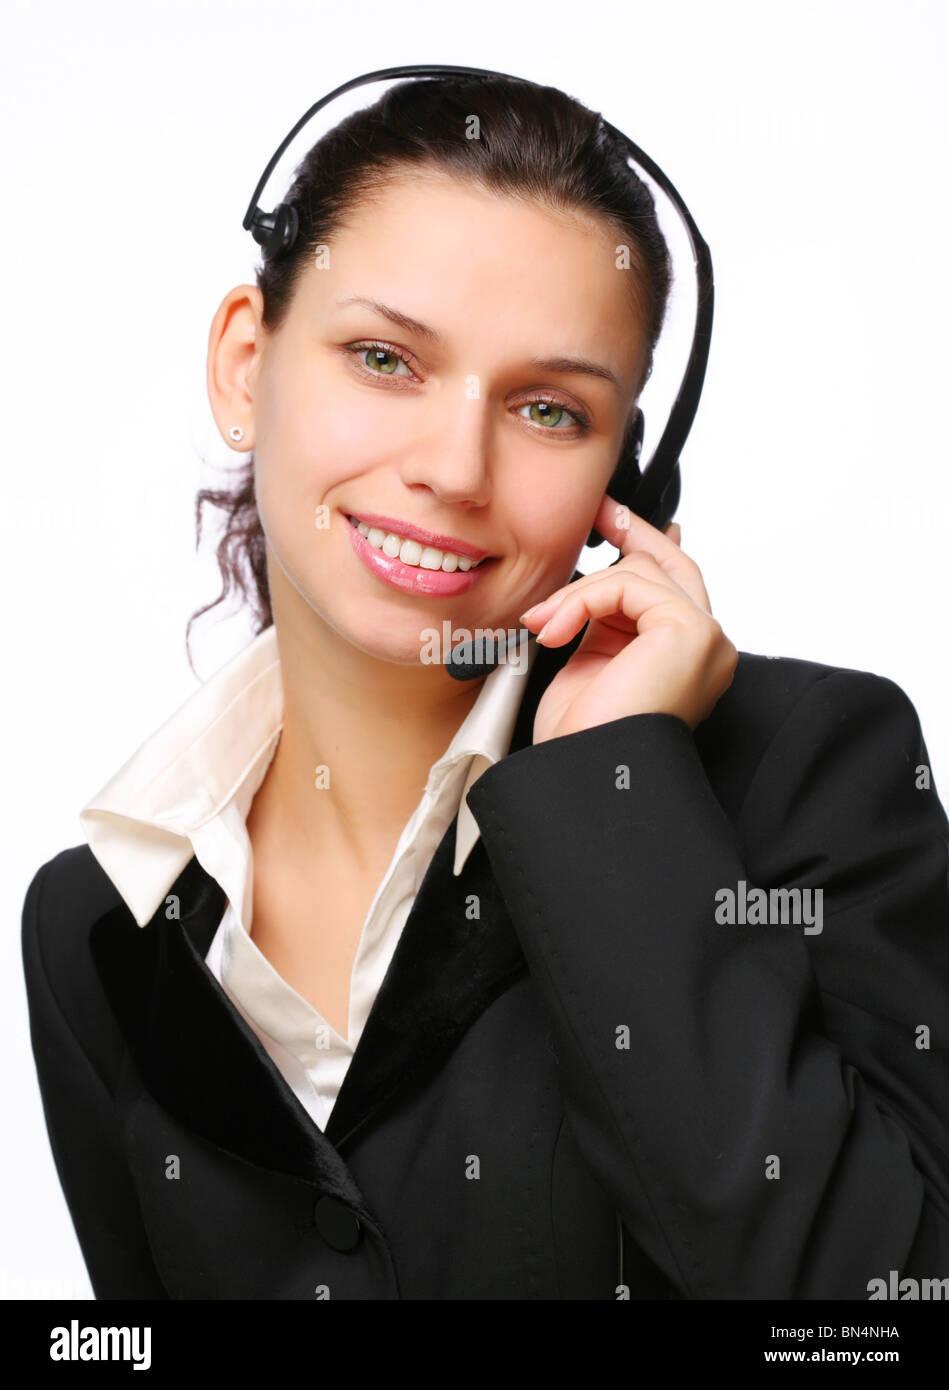 Smiling call-center operator. - Stock Image